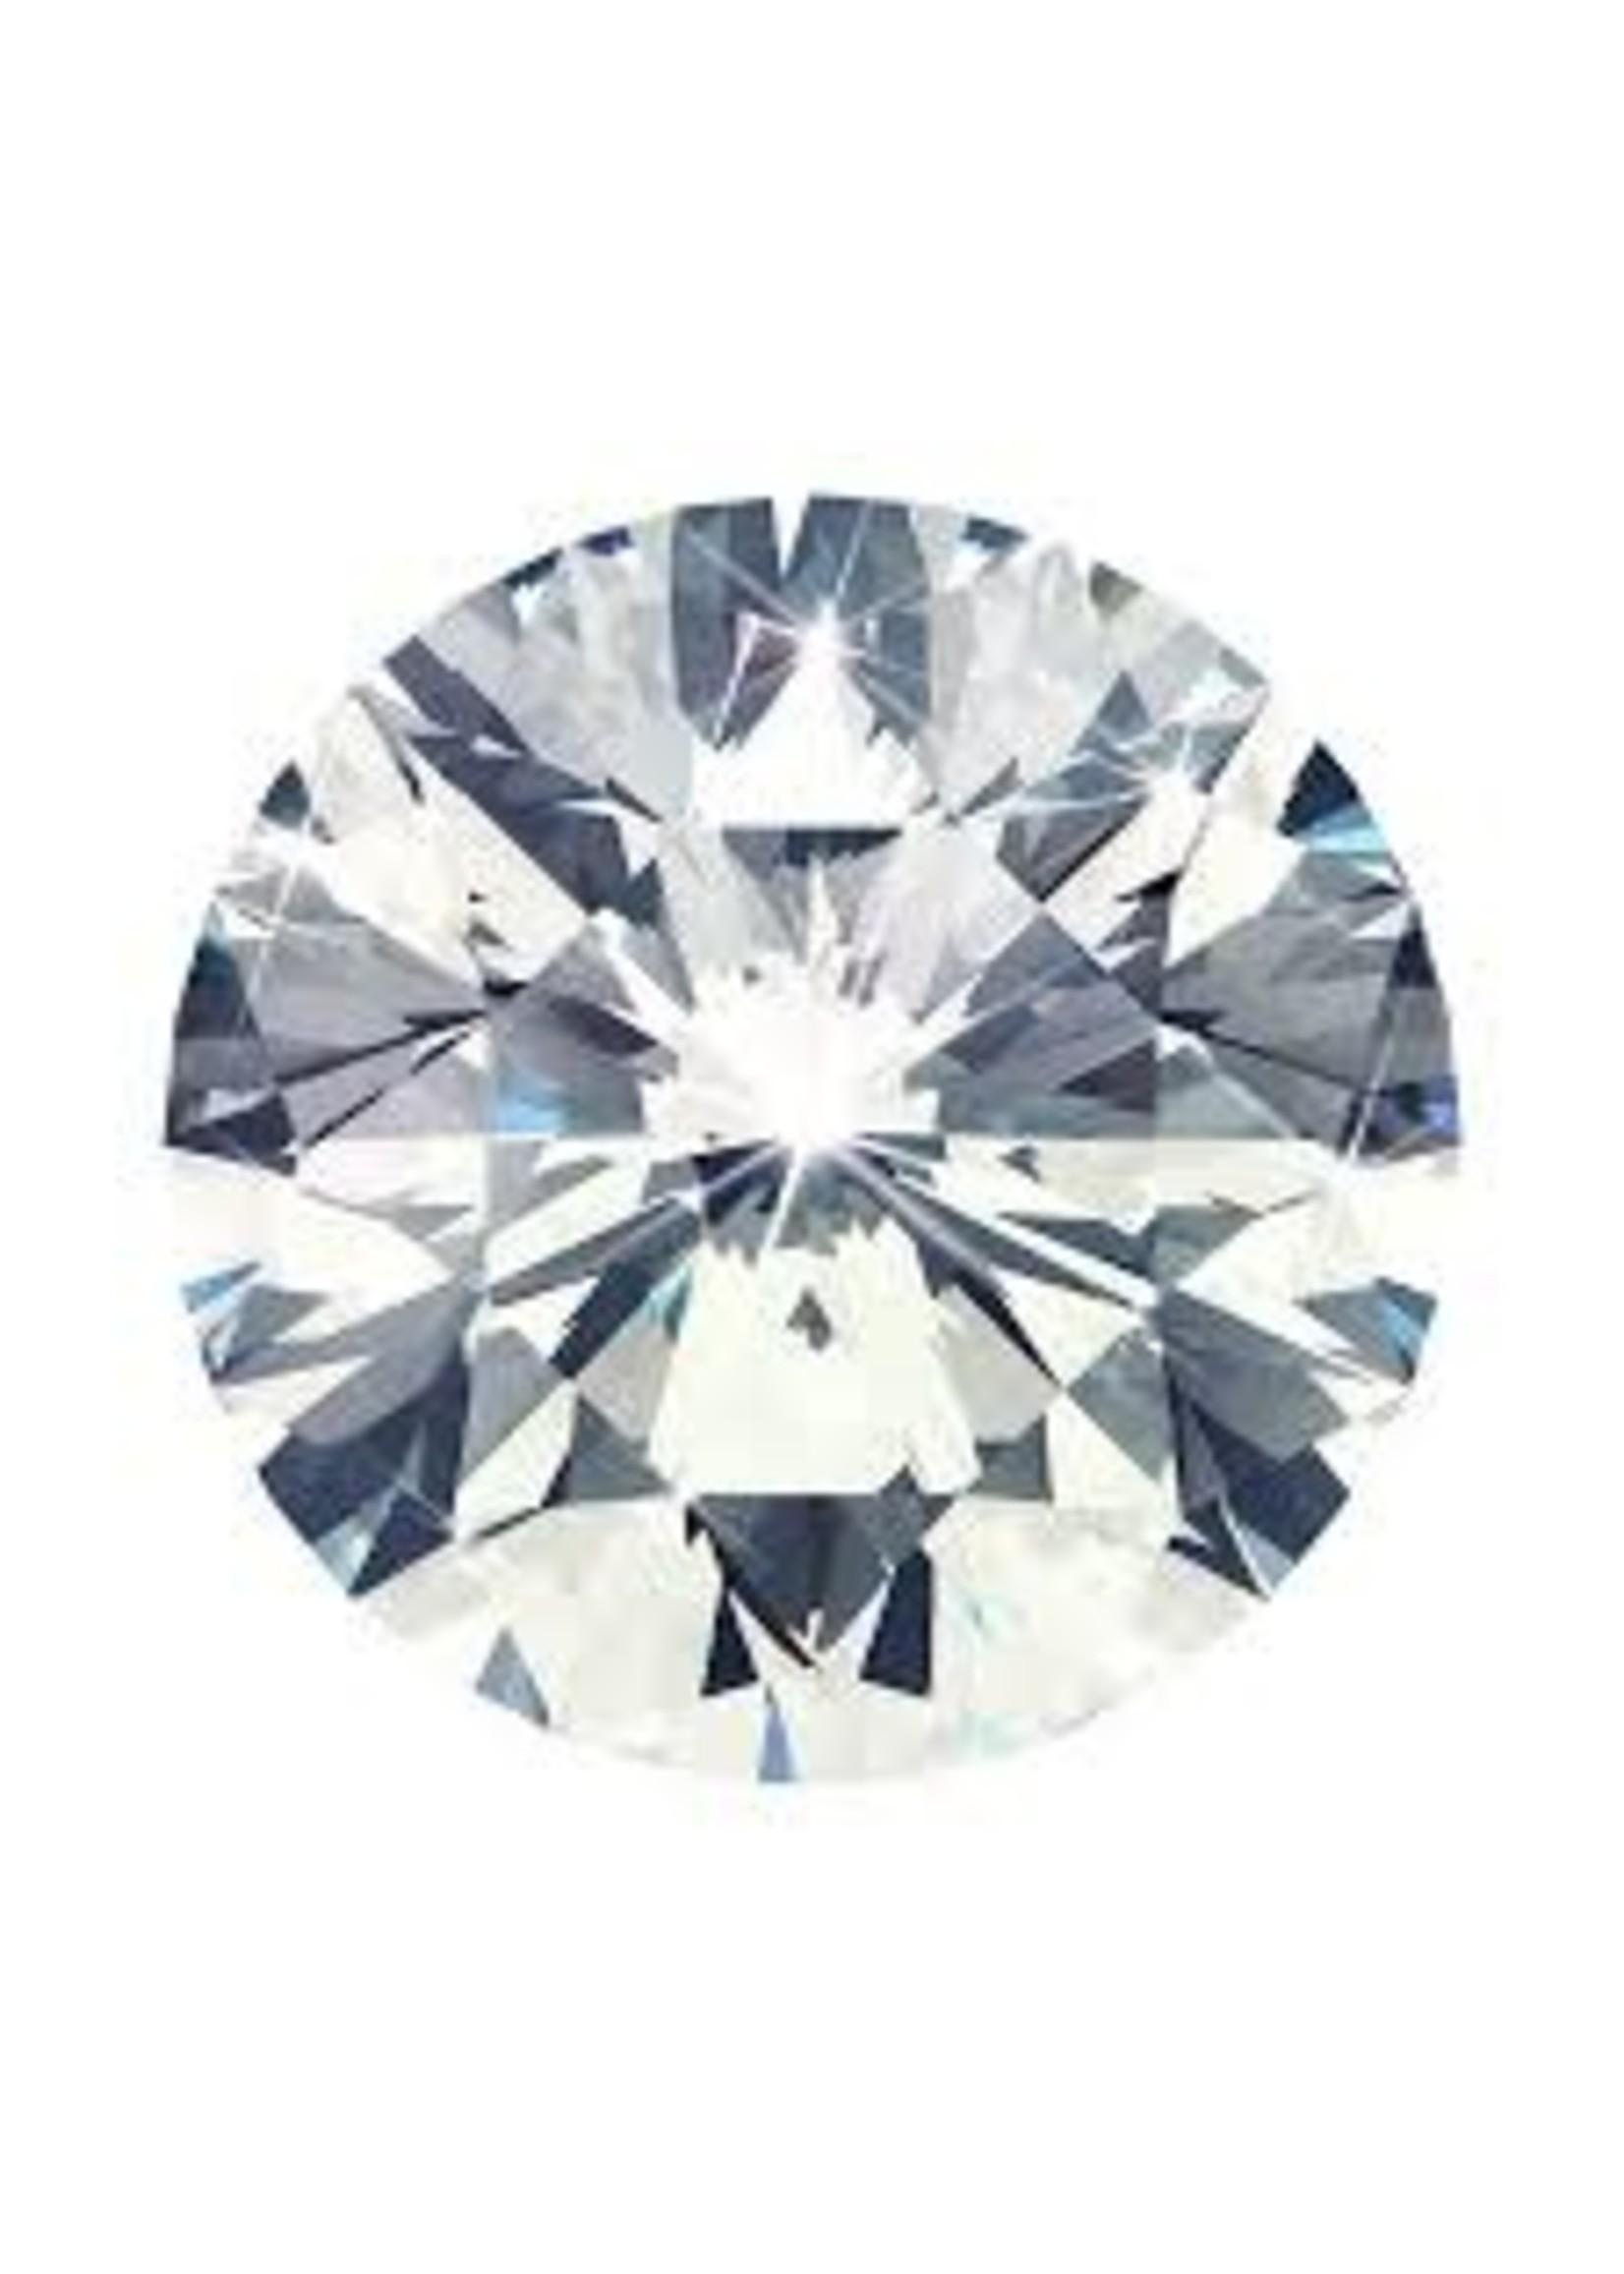 0.90CT ROUND BRILLIANT CUT DIAMOND (SI-1-H-GOOD)